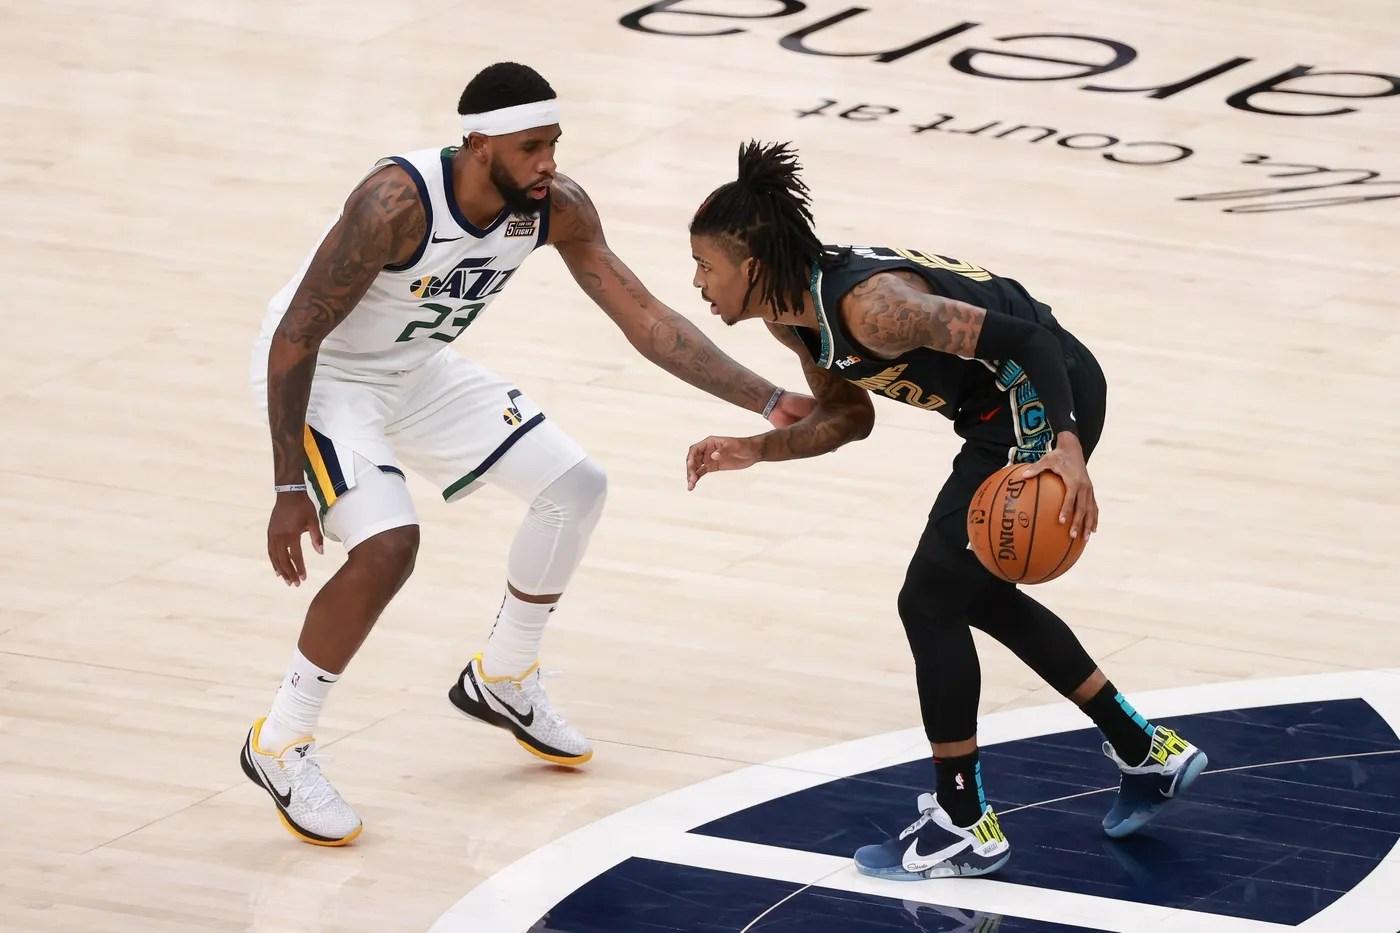 May 23, 2021; Salt Lake City, Utah, USA; Memphis Grizzlies guard Ja Morant (12) controls the ball against Utah Jazz forward Royce O'Neale (23) during the fourth quarter at Vivint Arena. Memphis Grizzlies won 112-109